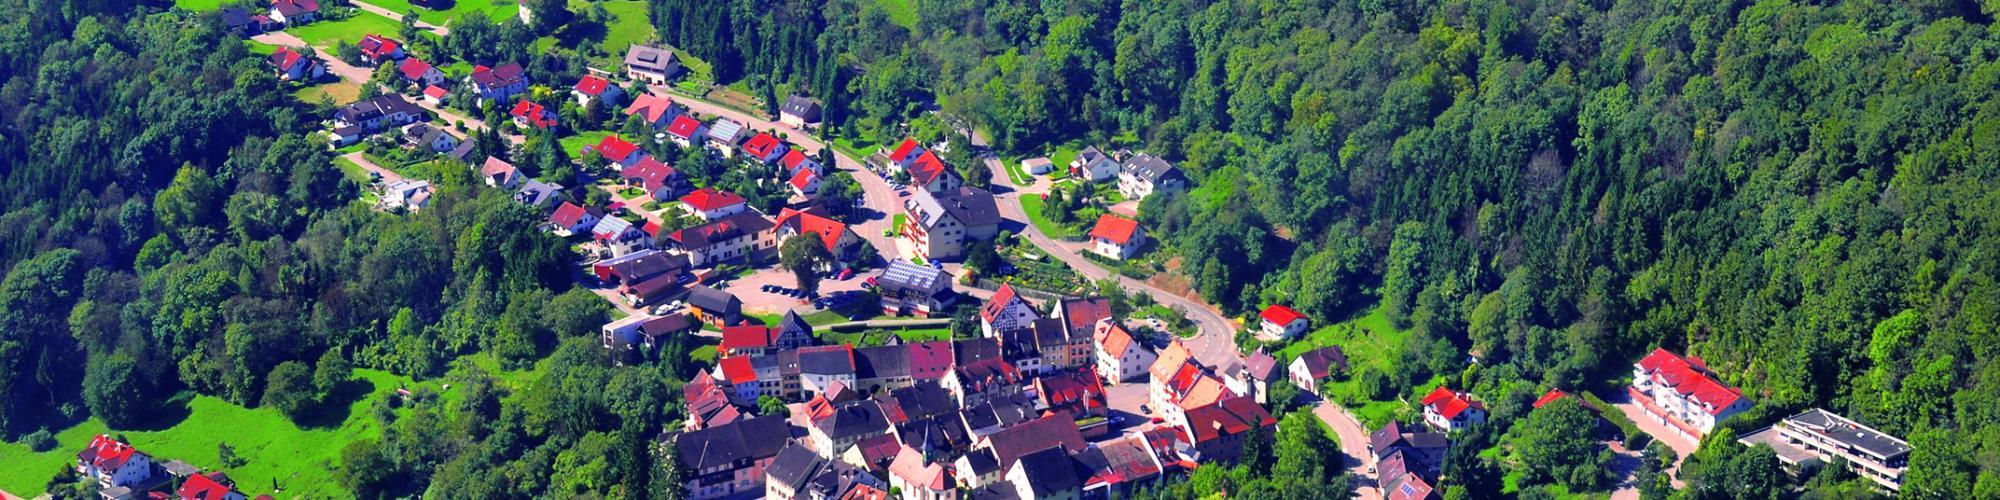 Stadt Stühlingen